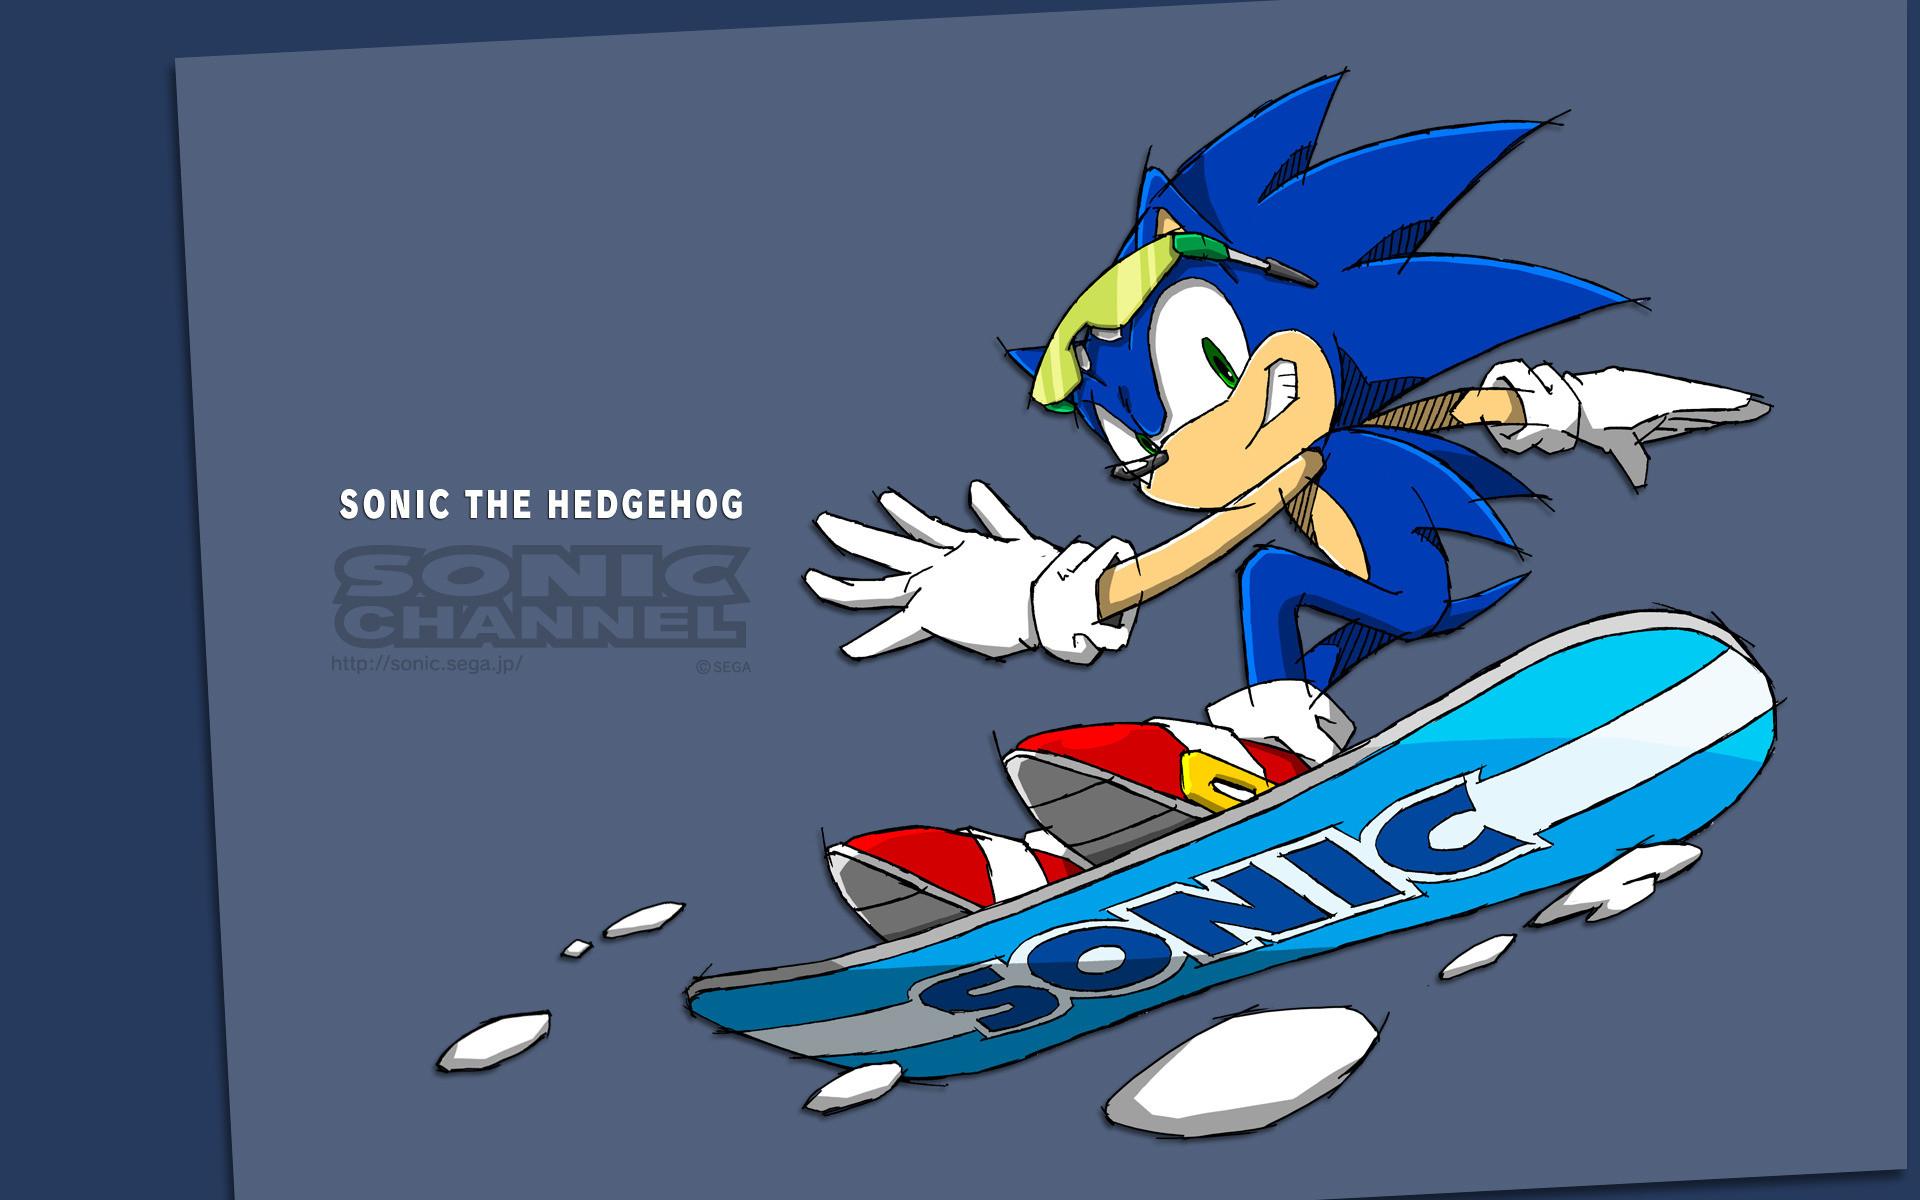 Sonic The Hedgehog Wallpaper hd Sonic The Hedgehog hd